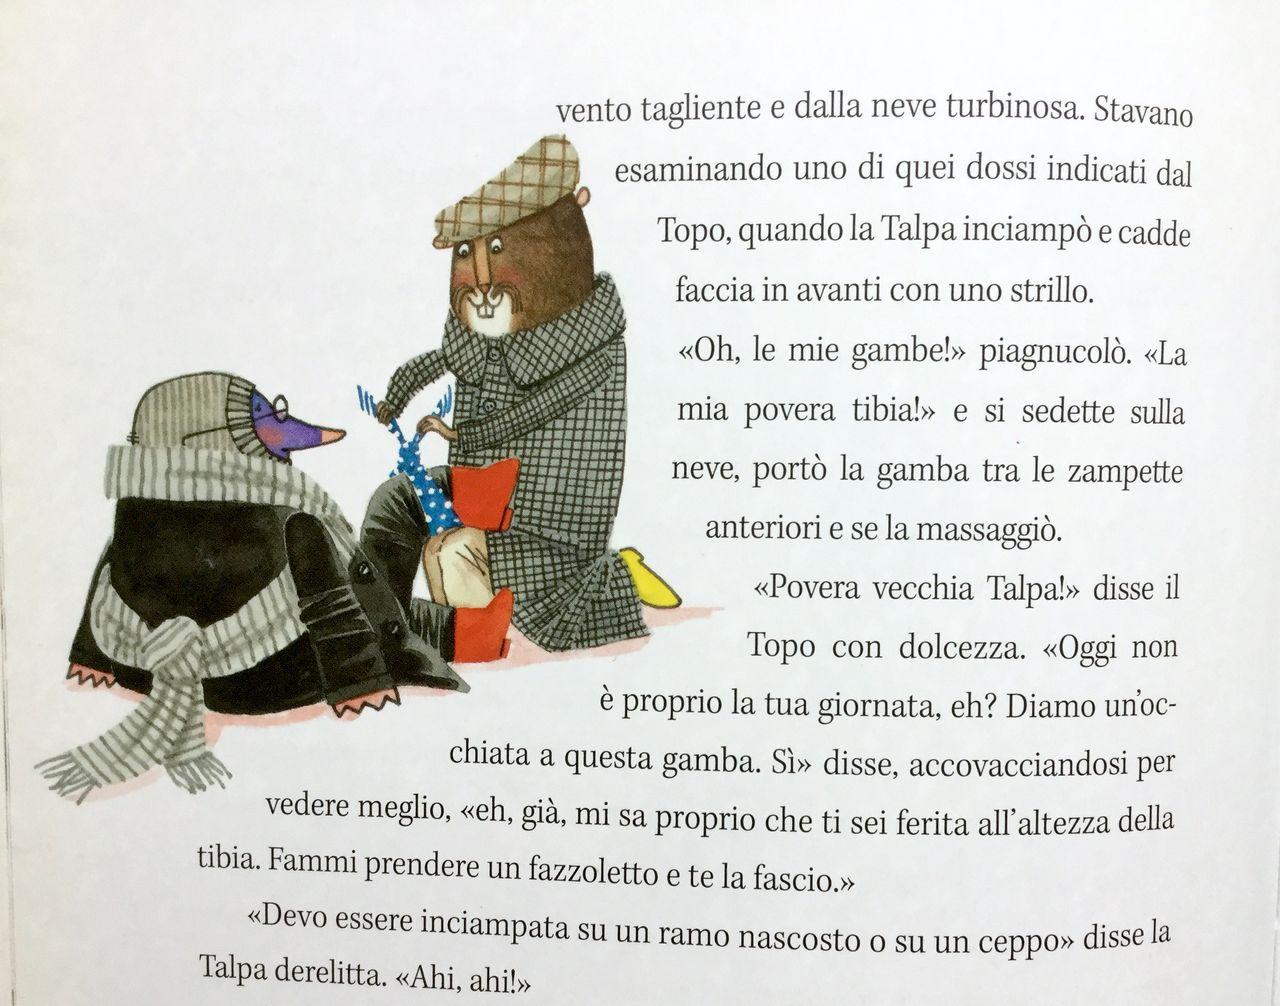 K. Grahame - D. Roberts, Il vento tra i salici, Rizzoli